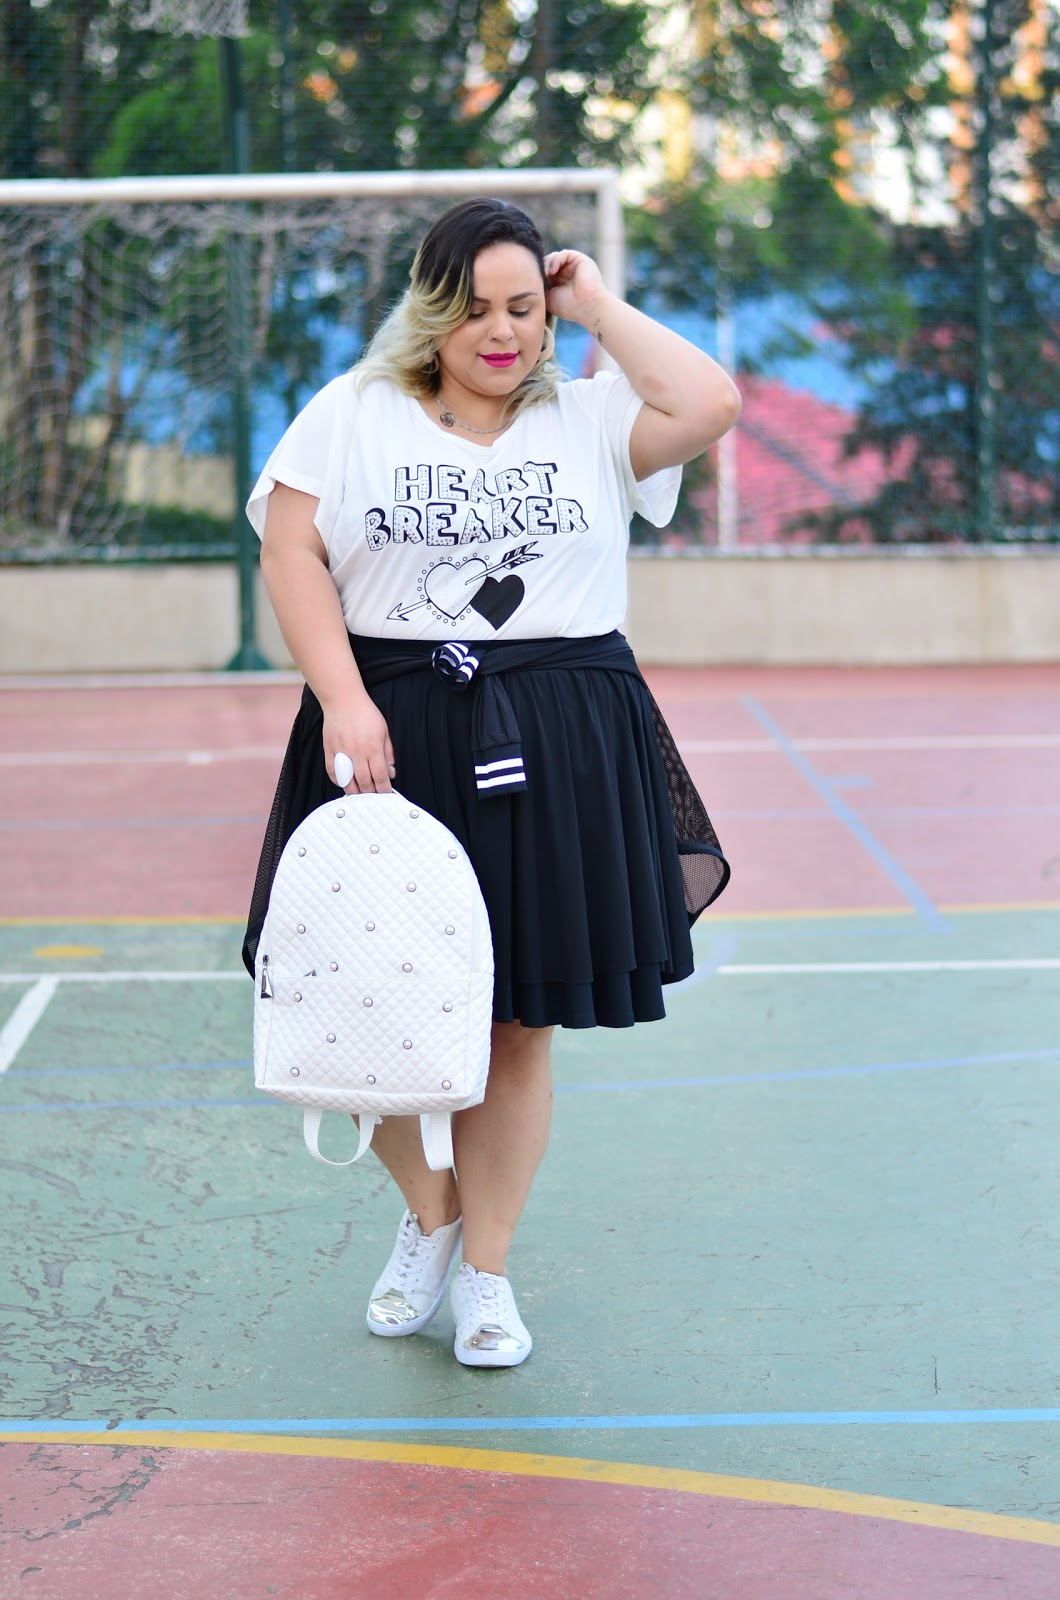 blog plus size, blusas femininas, blusas plus size, colete plus size,  comprar saia, moda plus size, roupas da moda, roupas online, roupas para revender,  saia plus size, blogueira plus size, moda plus size, moda, roupas